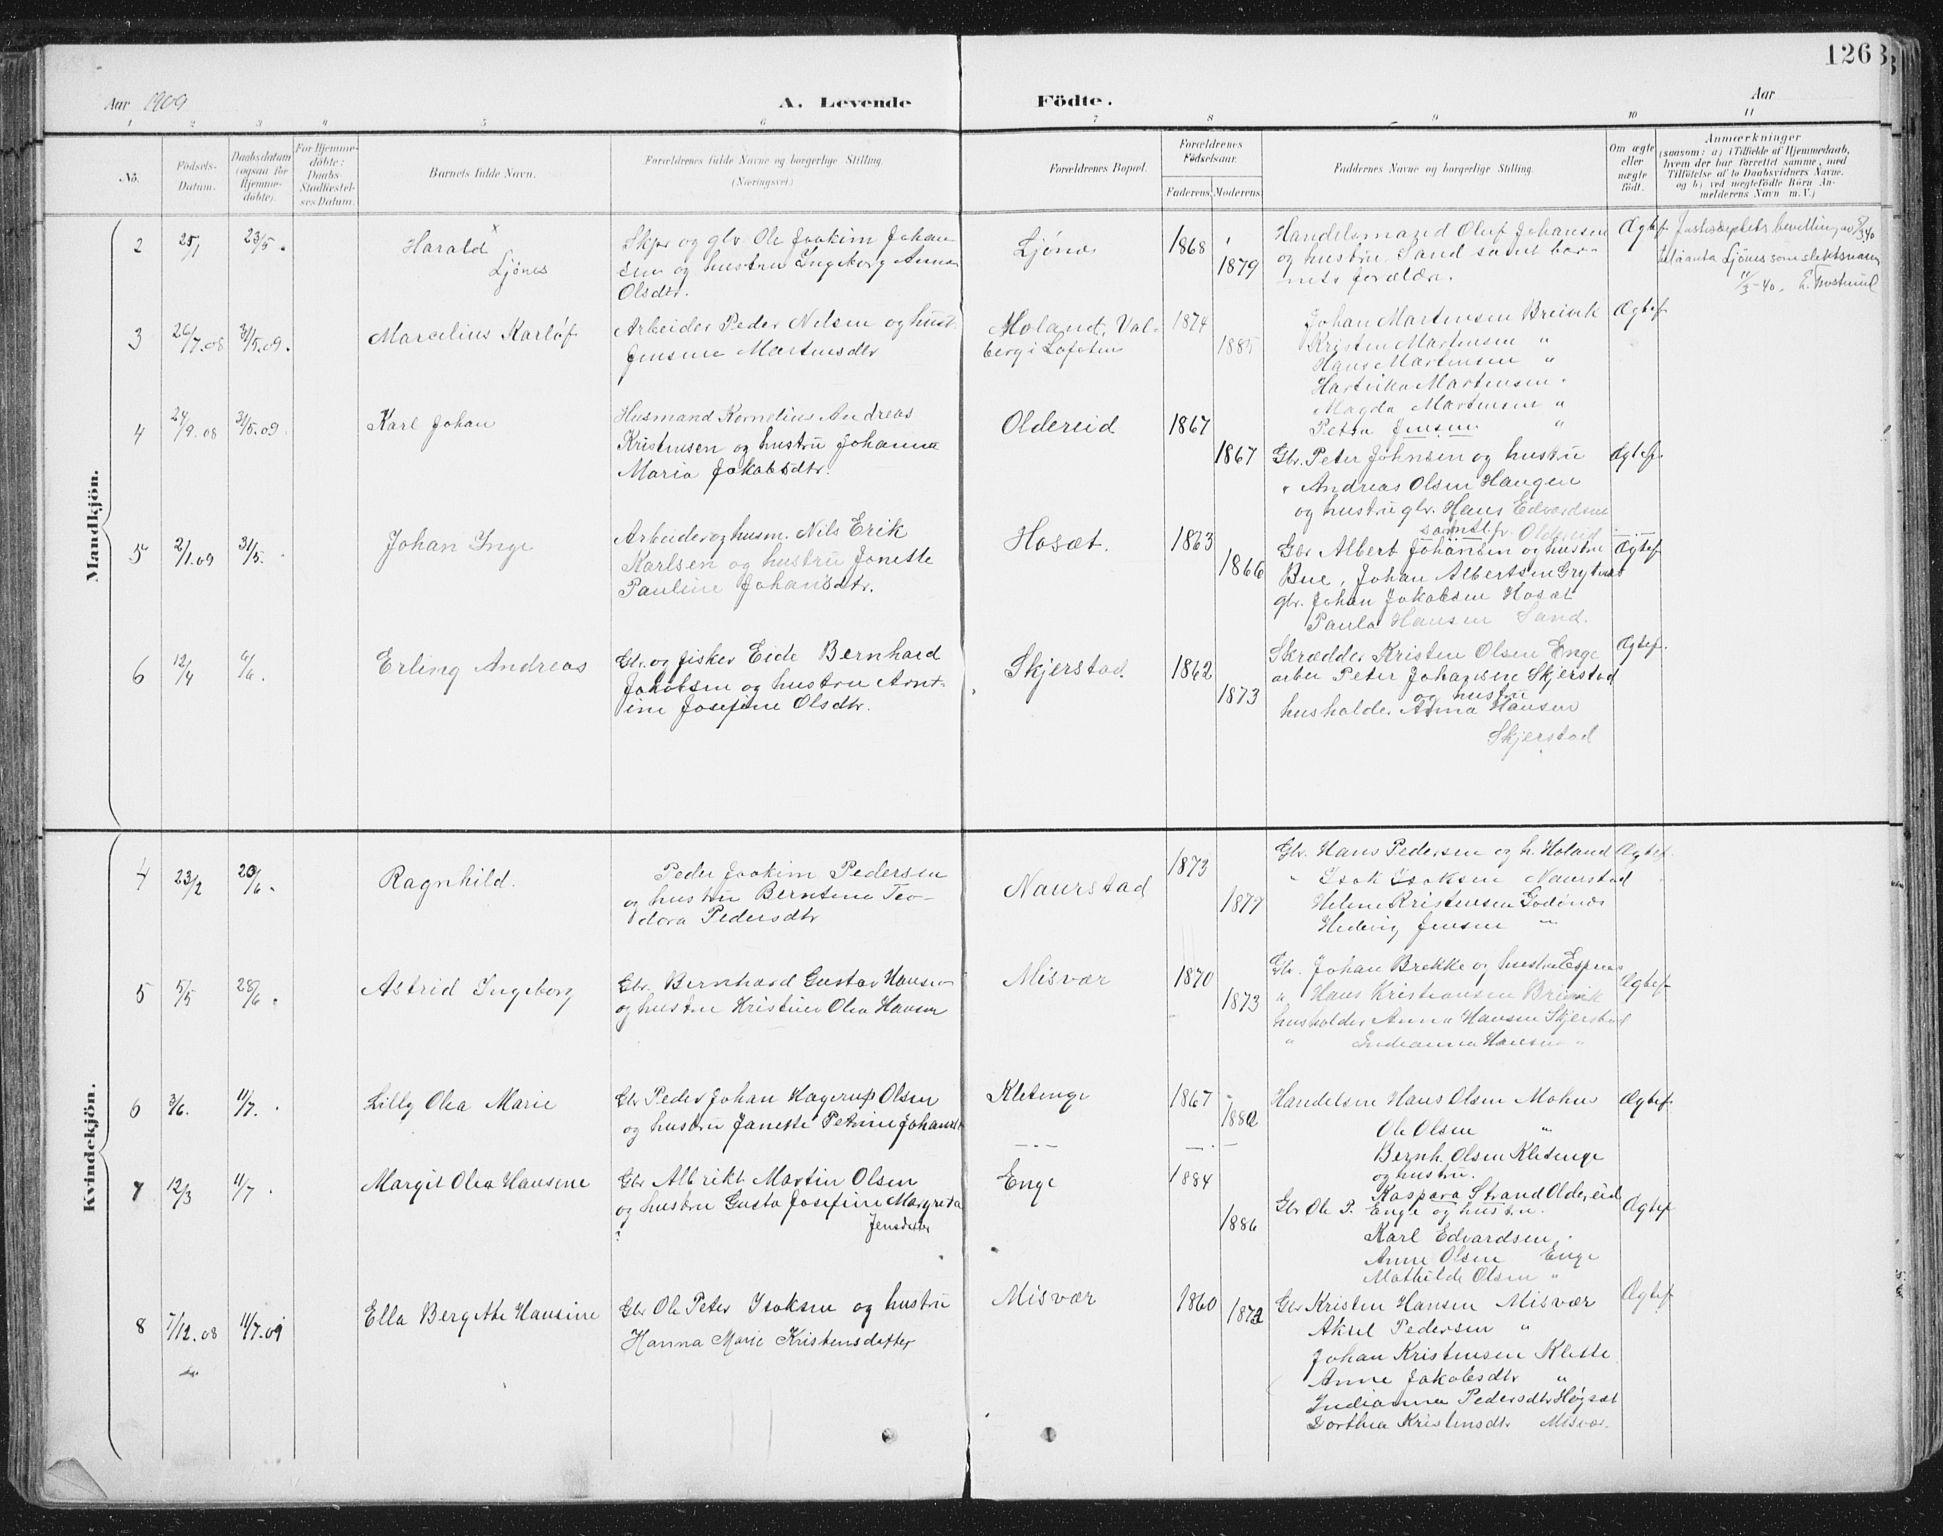 SAT, Ministerialprotokoller, klokkerbøker og fødselsregistre - Nordland, 852/L0741: Ministerialbok nr. 852A11, 1894-1917, s. 126